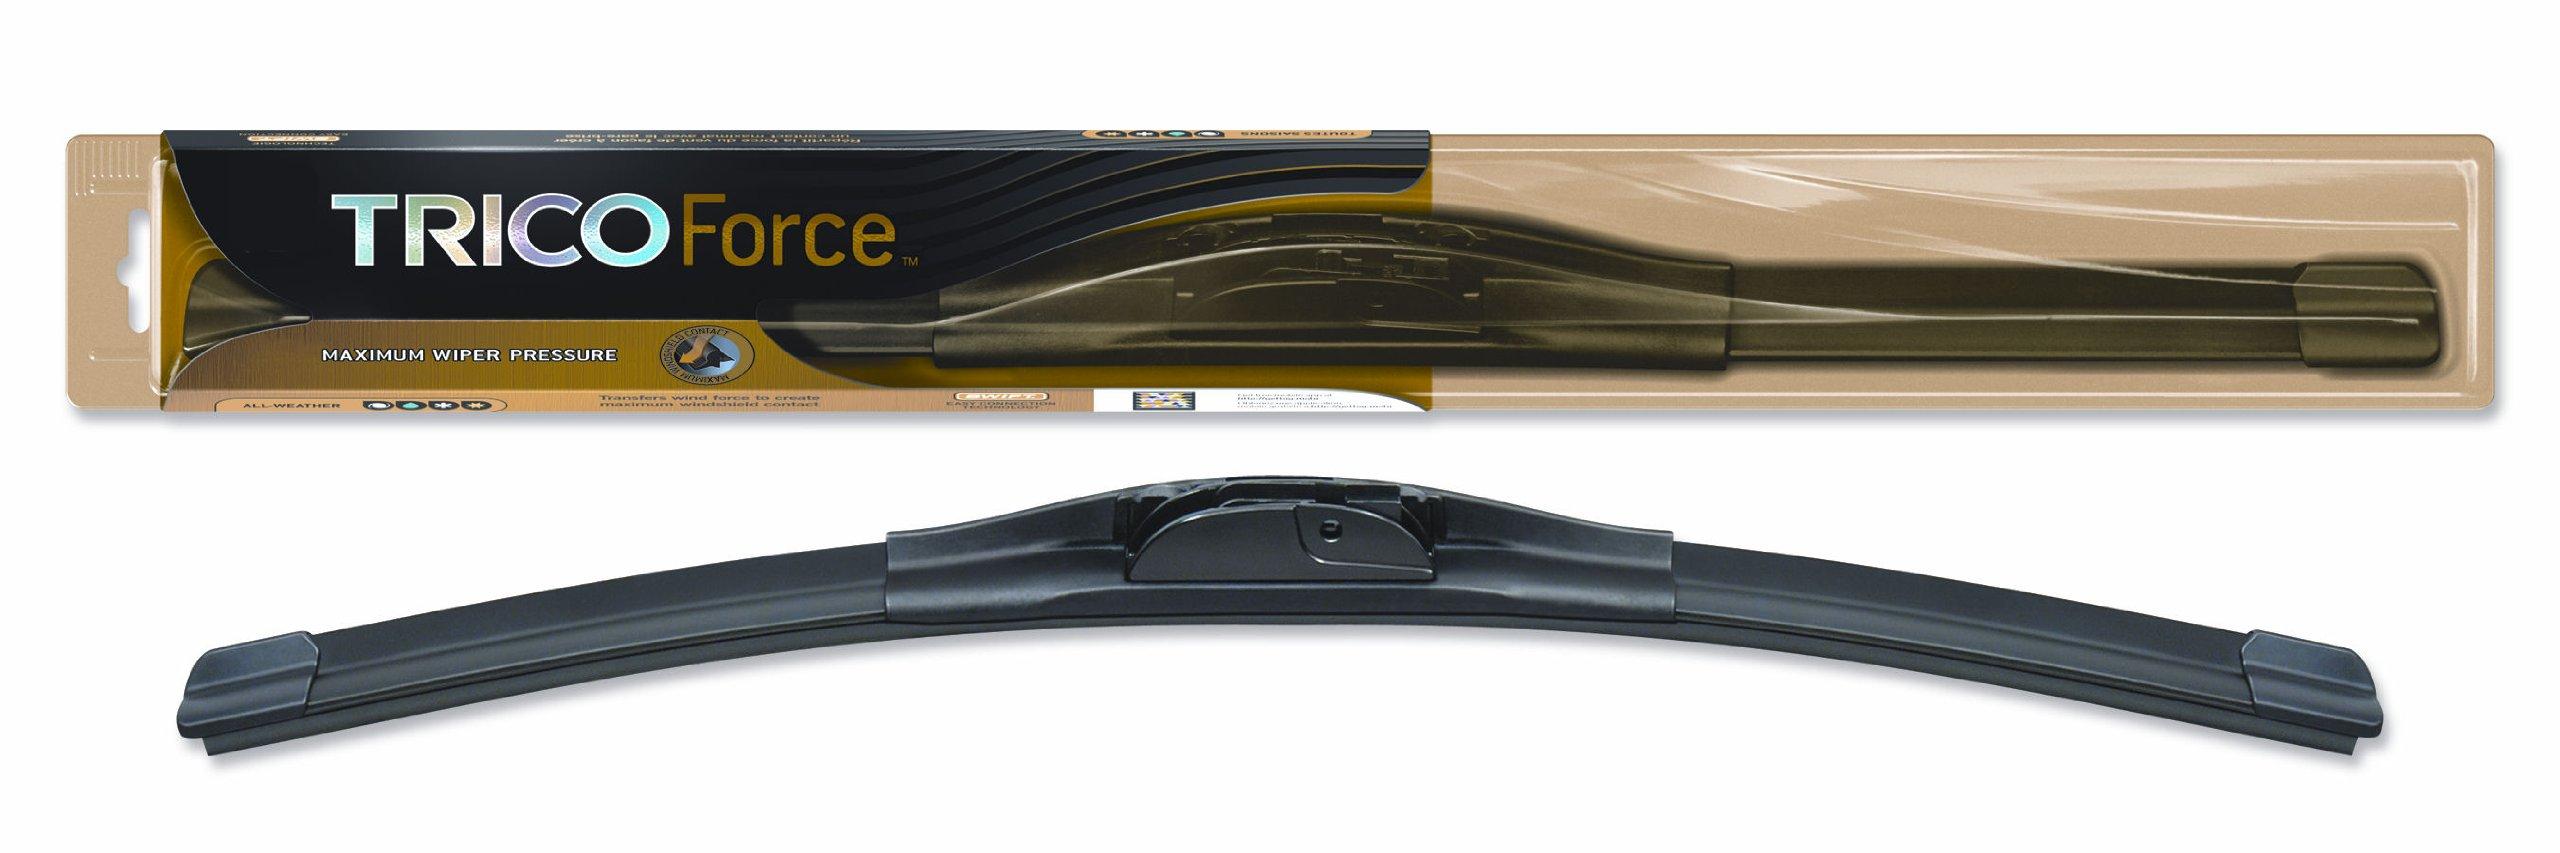 Trico  25-190 Force Premium Performance Beam Wiper Blade, 19''